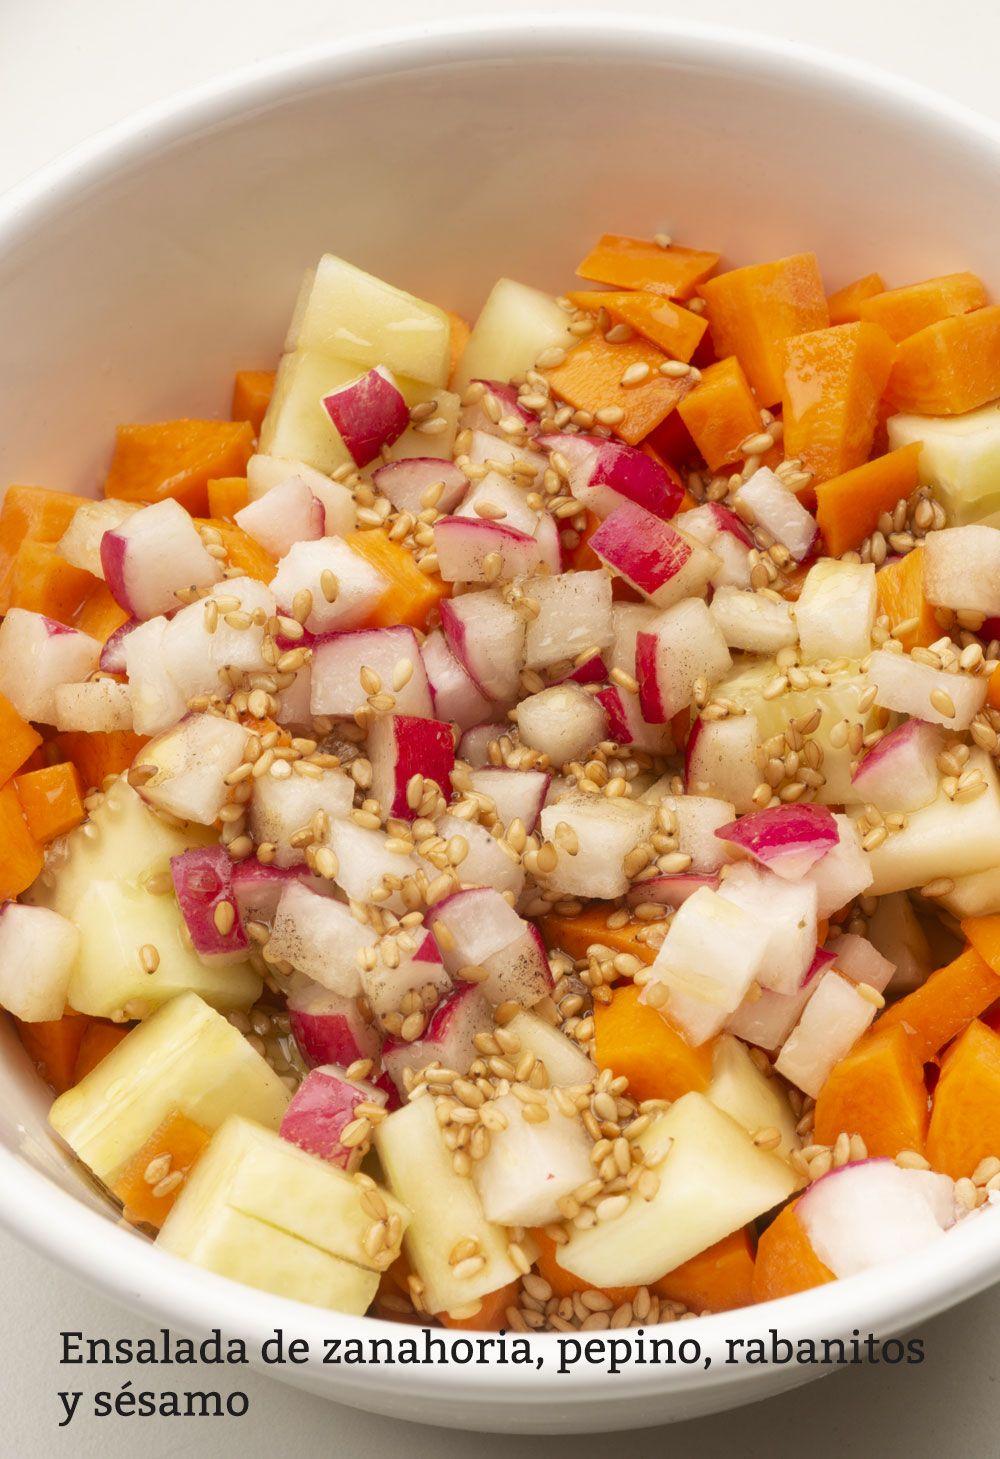 Ensalada de zanahoria, pepino, rabanitos y sésamo